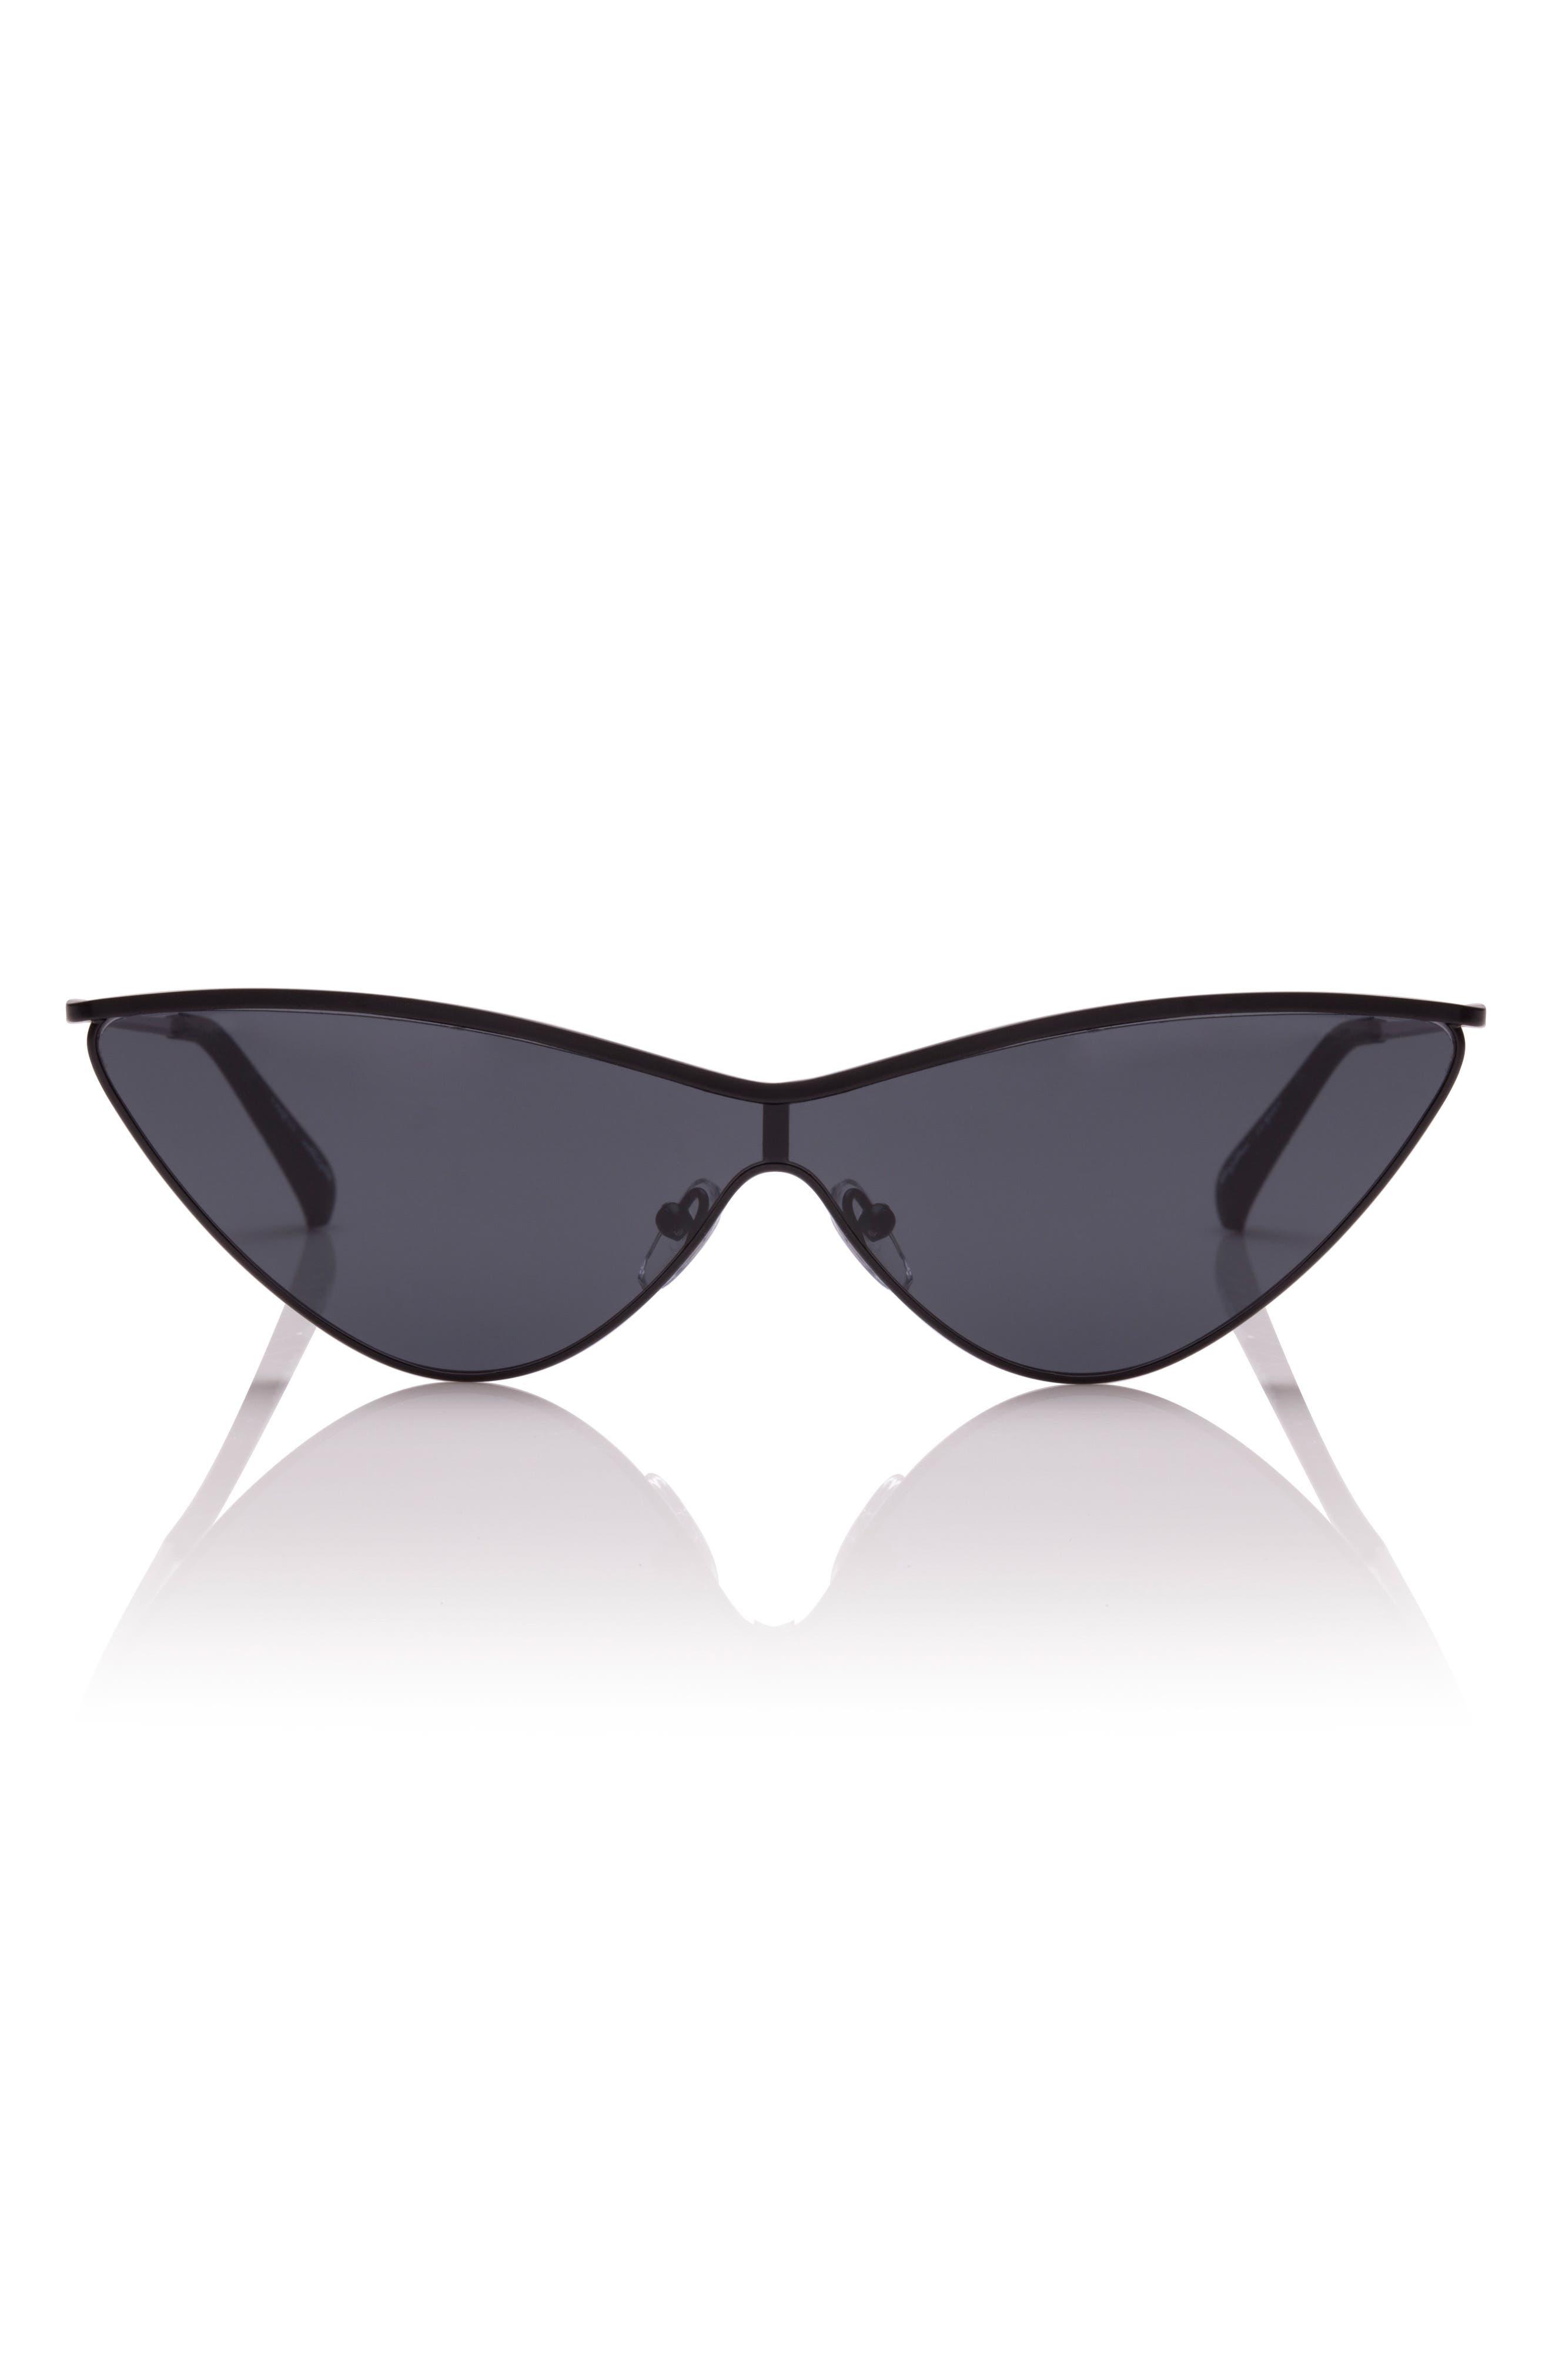 Main Image - Le Specs x Adam Selman The Fugitive 71mm Sunglasses